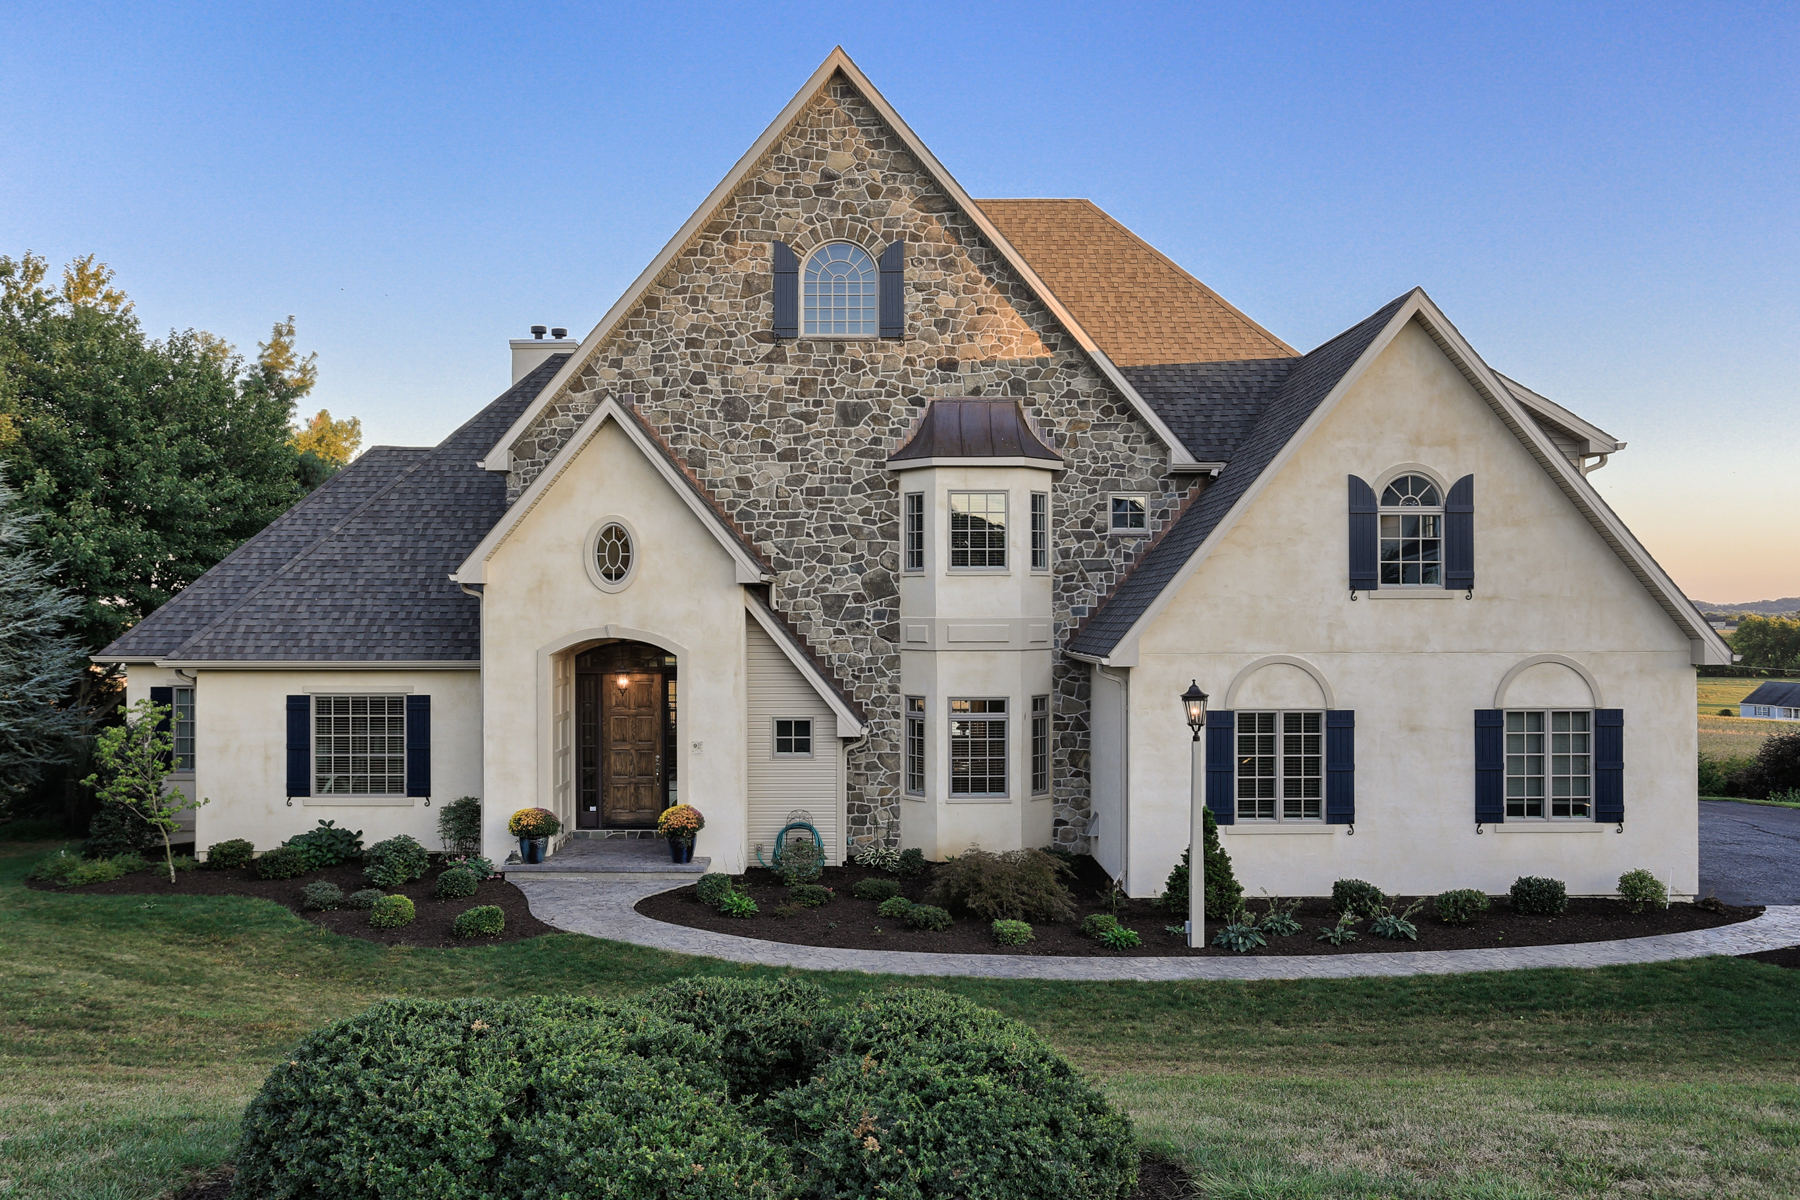 Single Family Home for Sale at Buckwood Hills 9 Oakwood Lane Lititz, Pennsylvania 17543 United States